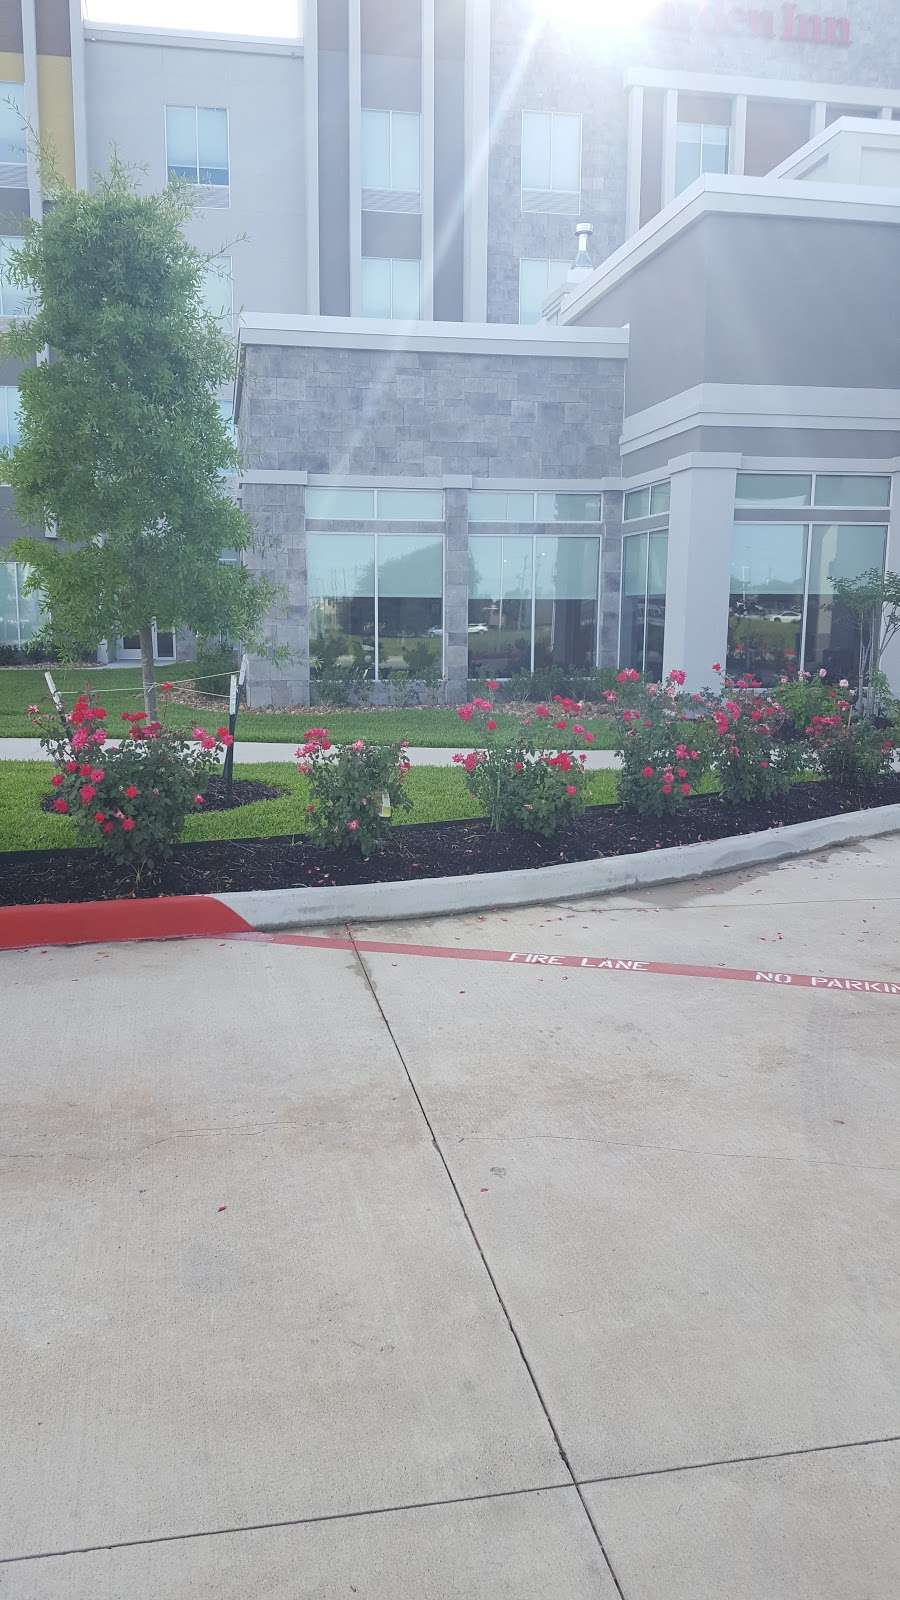 Hilton Garden Inn Houston-Baytown - lodging  | Photo 10 of 10 | Address: 4910 E Chase St, Baytown, TX 77521, USA | Phone: (281) 838-8208